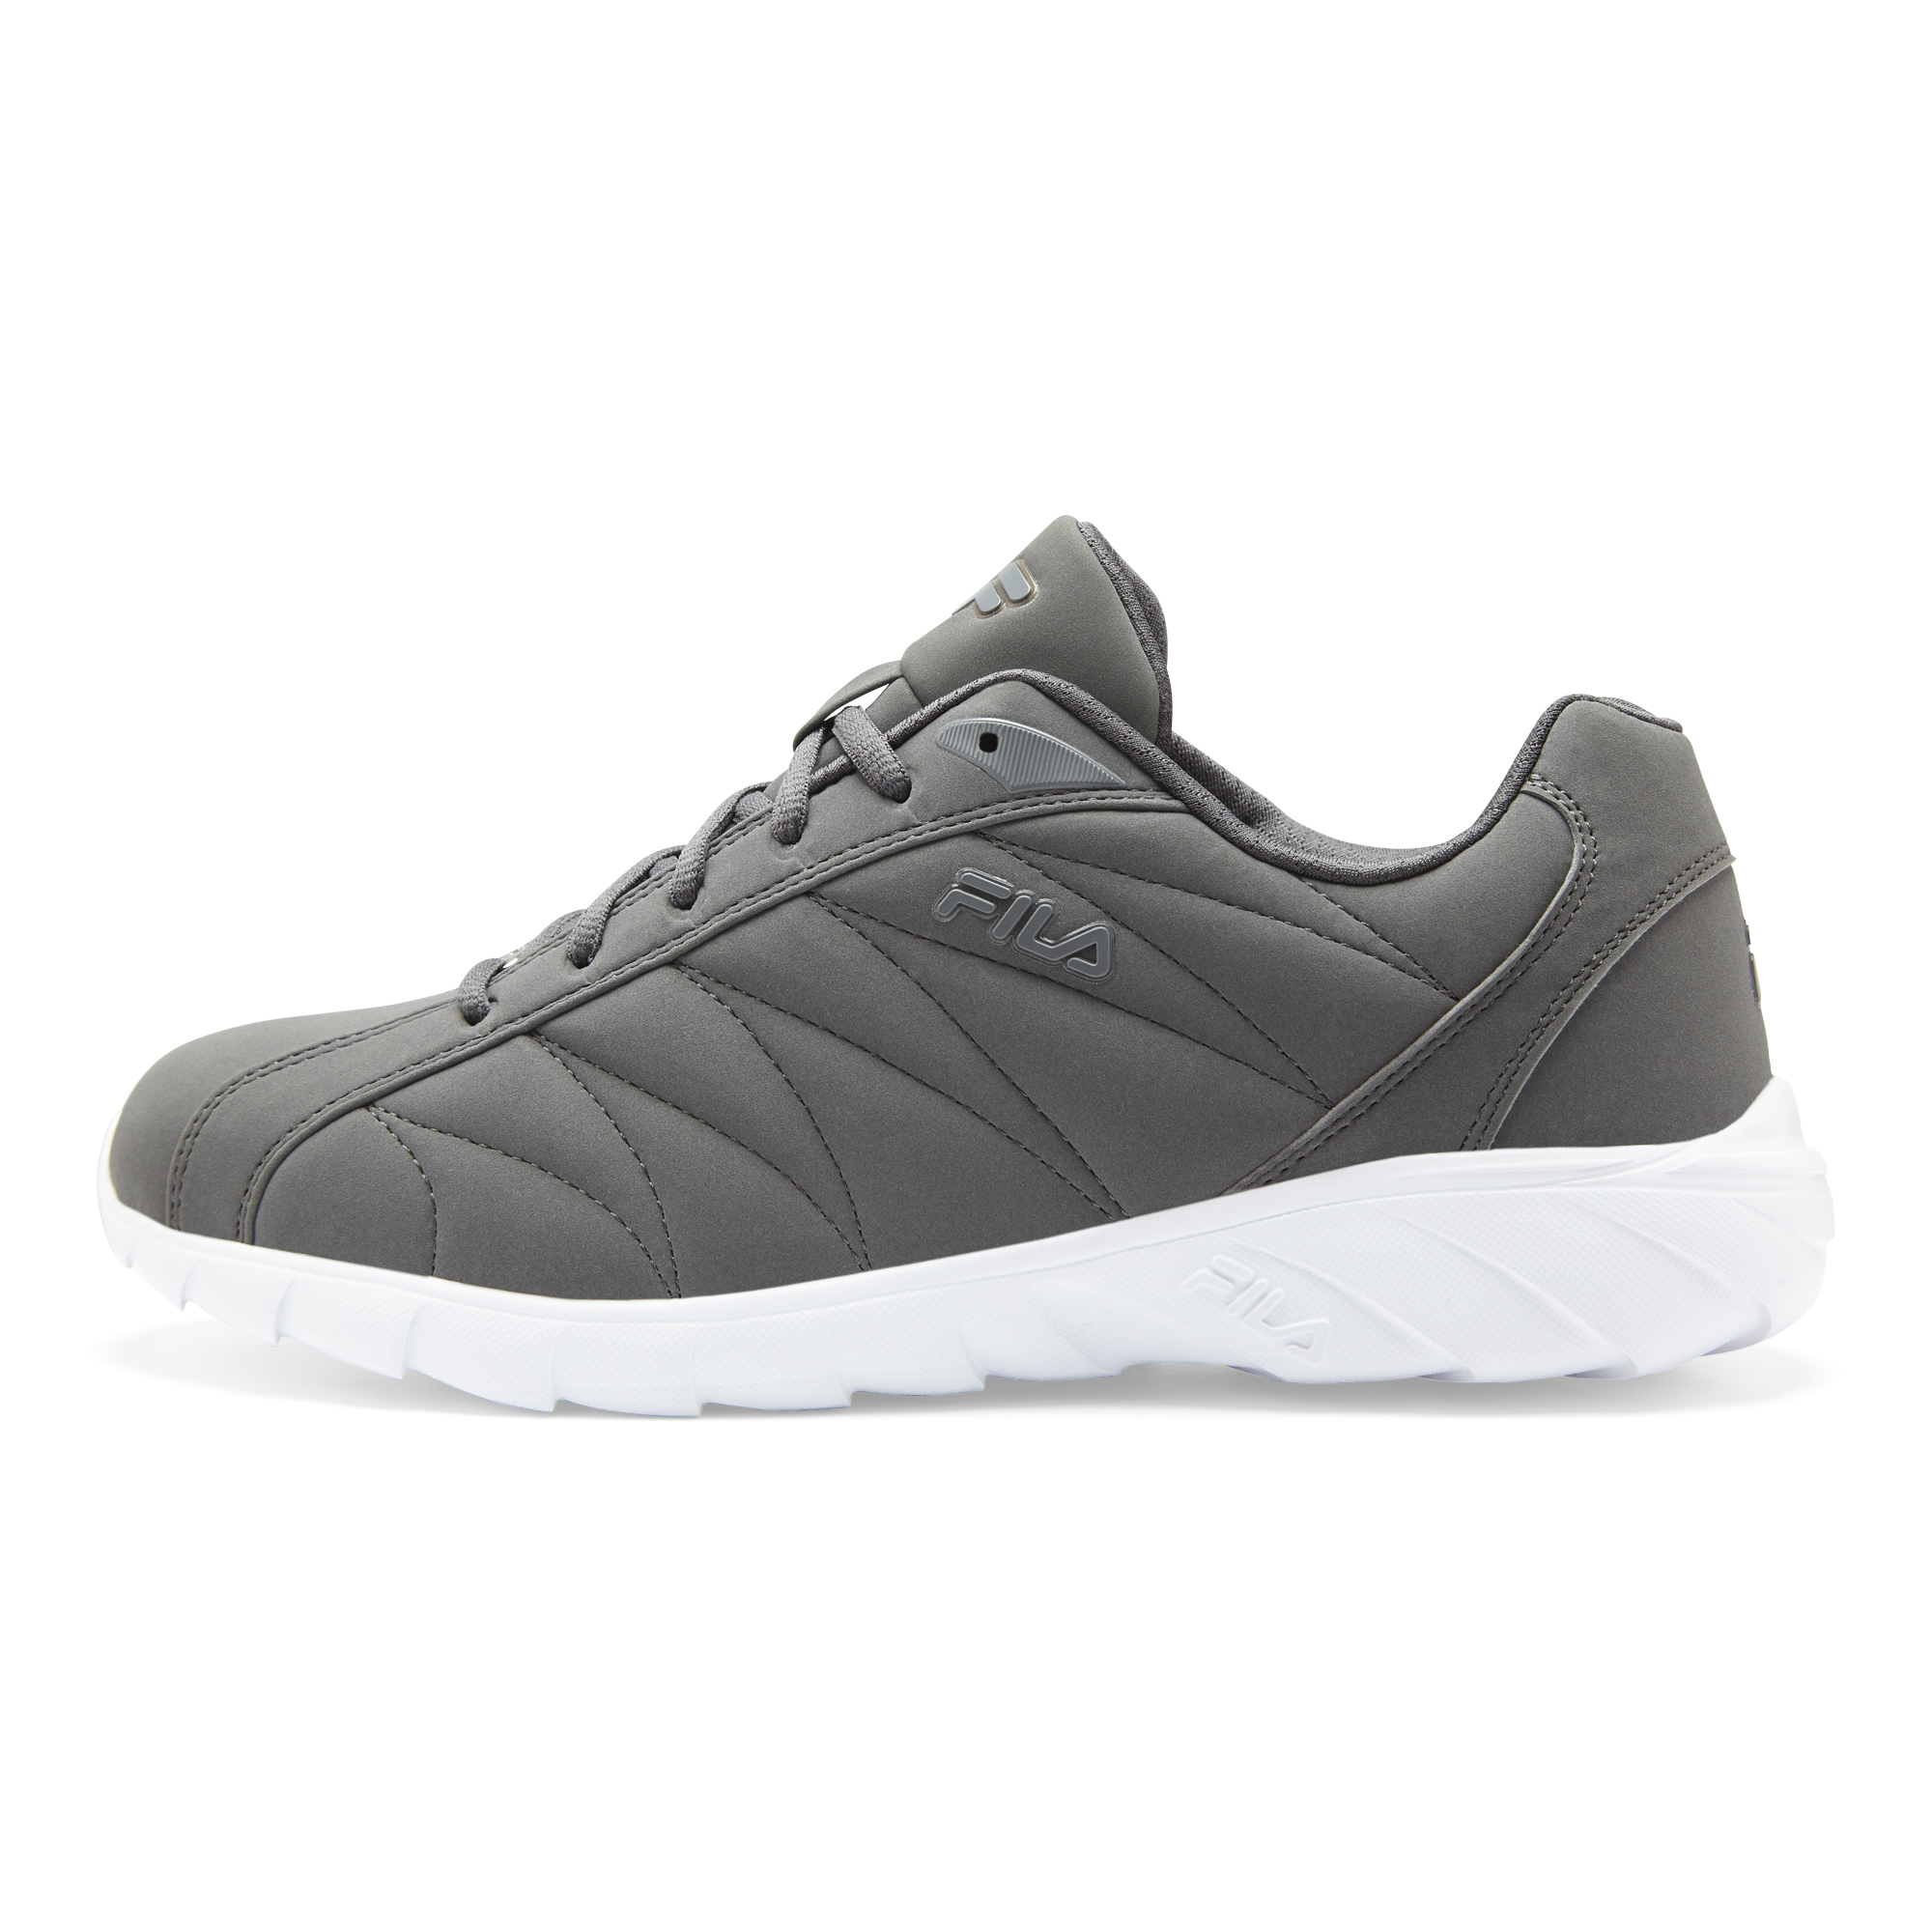 843b41eea093 Fila Men s Segora Casual Shoe